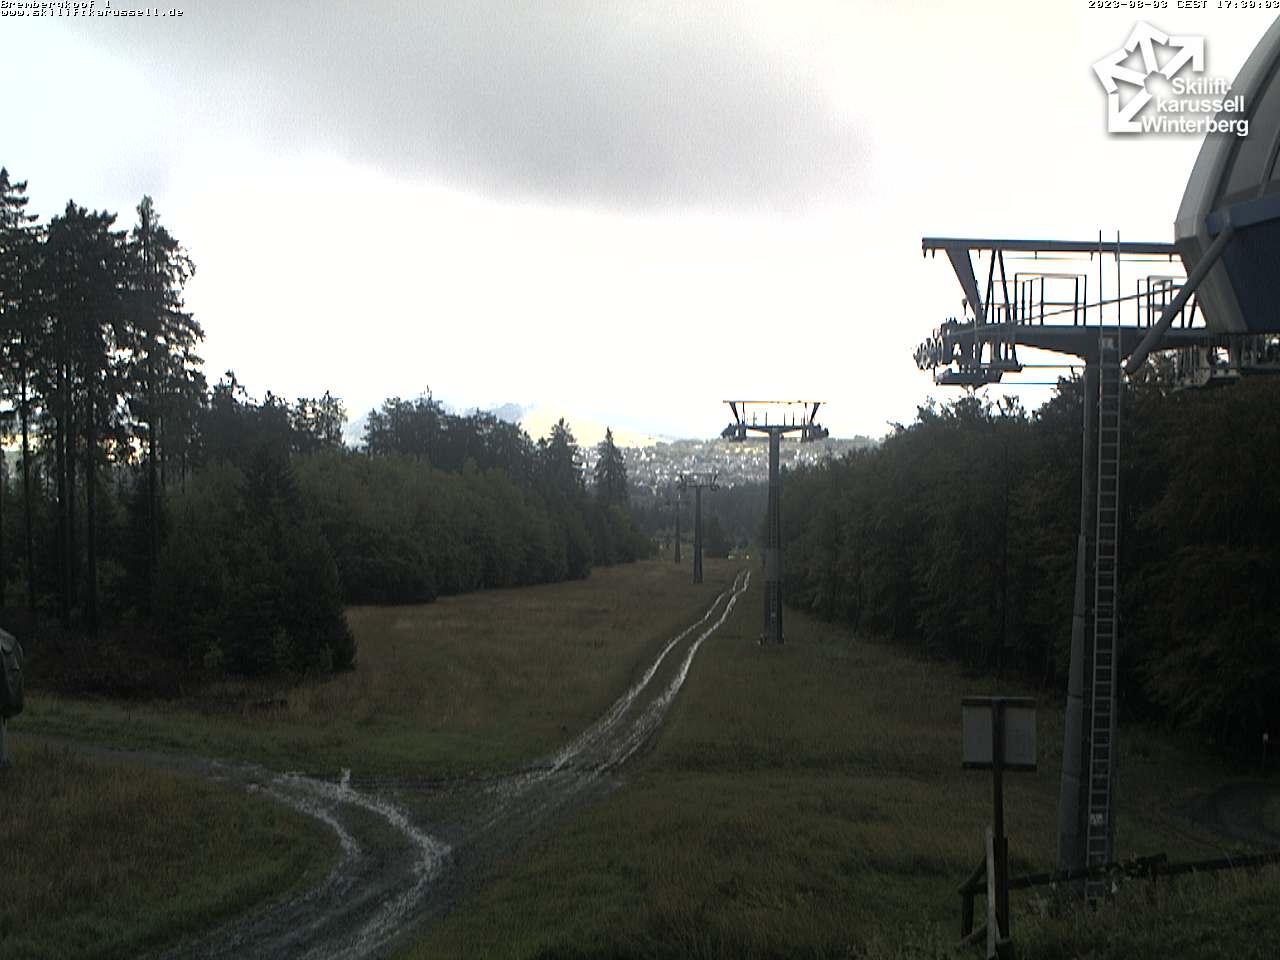 Webcam Winterberg - Skilift Brembergkopf